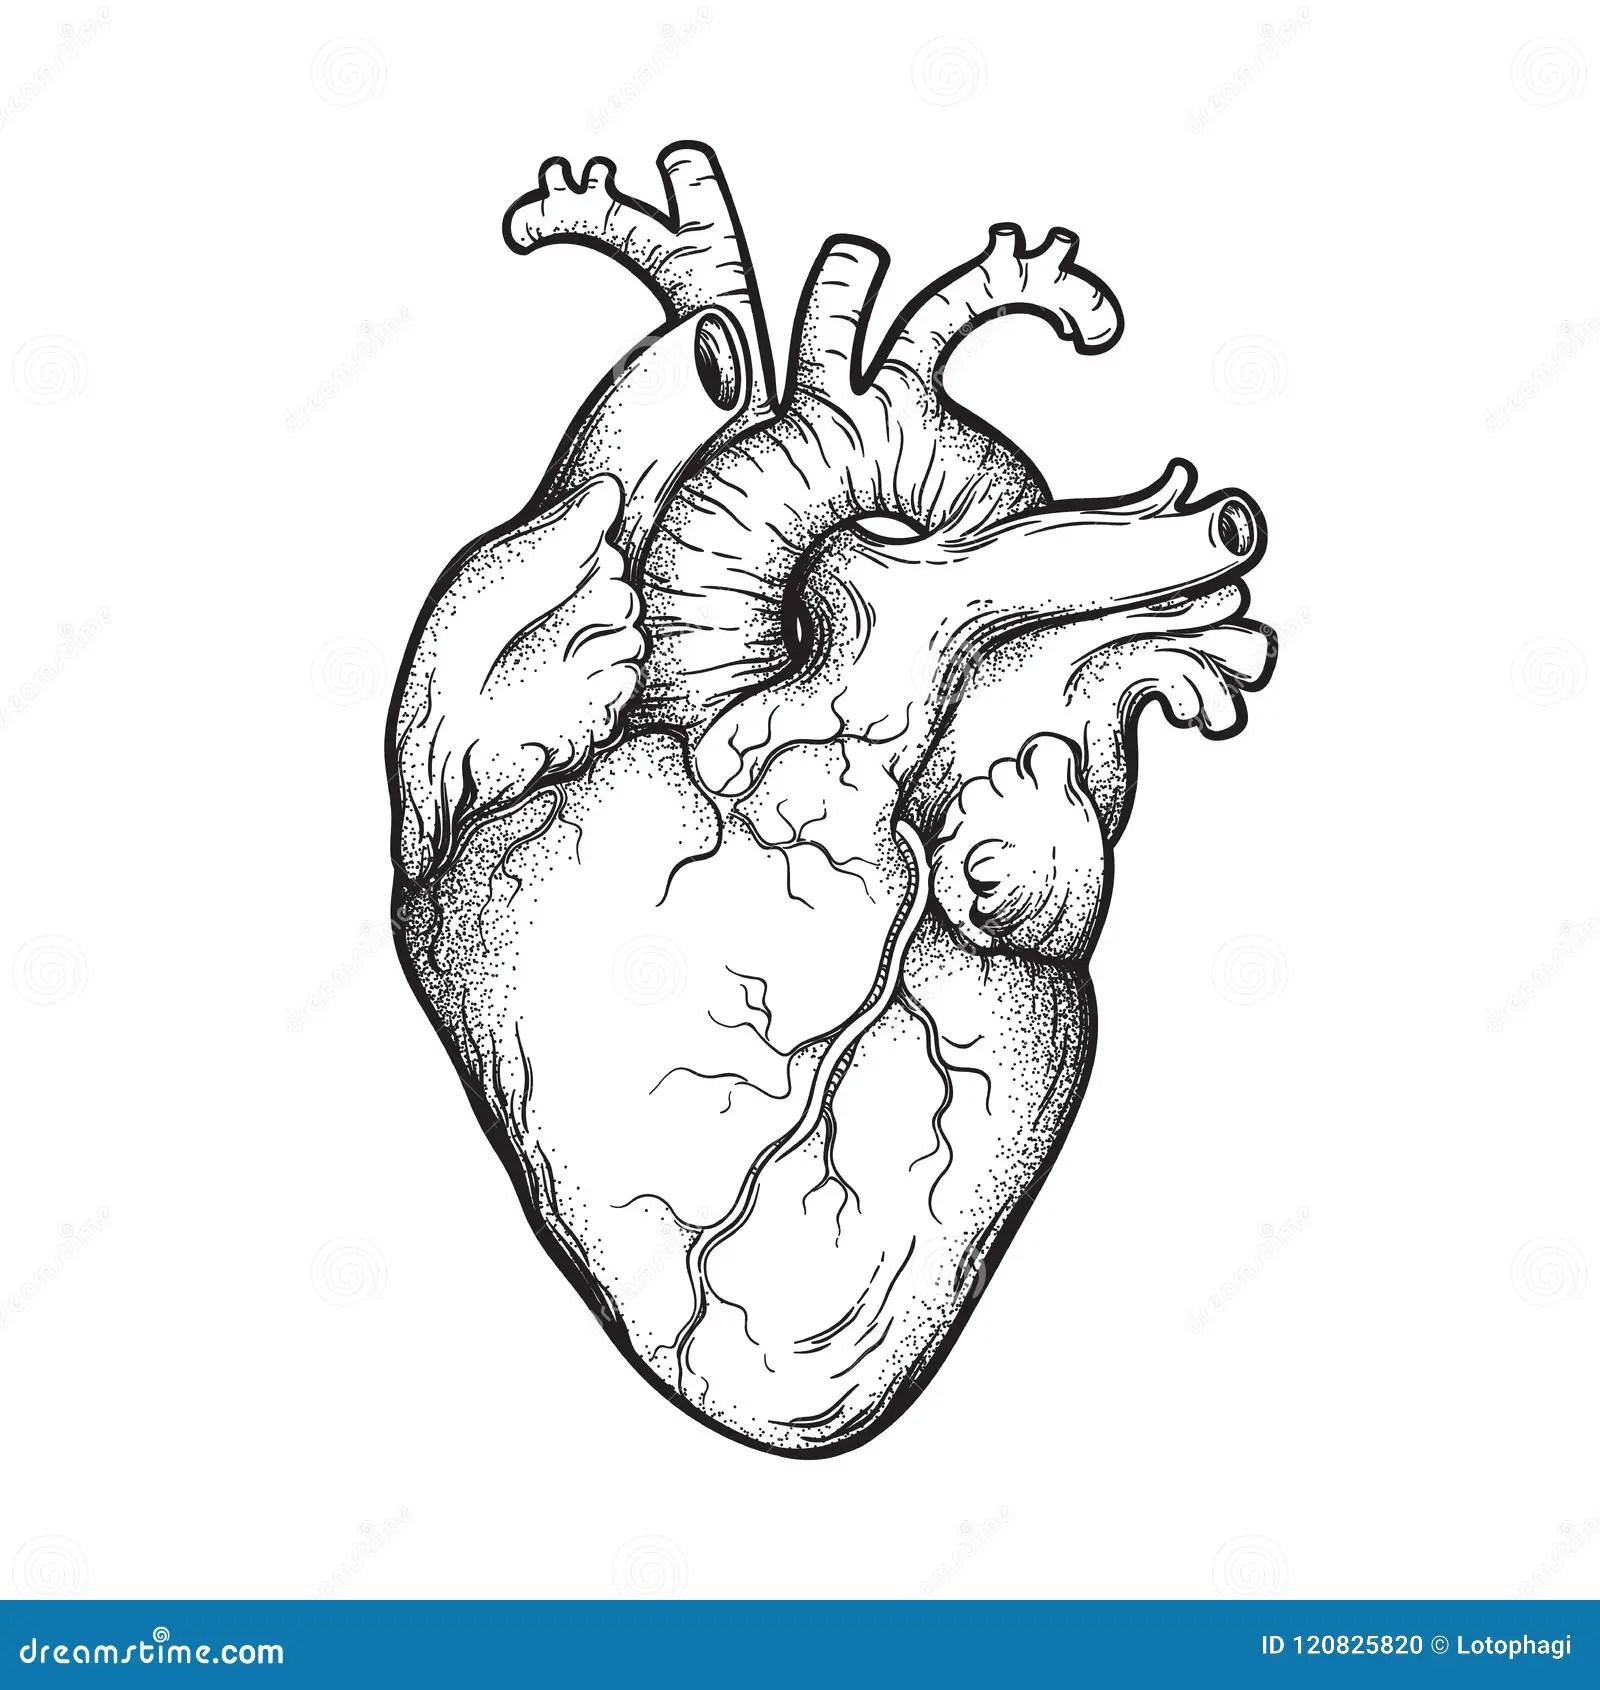 Human Heart Anatomically Correct Hand Drawn Line Art And